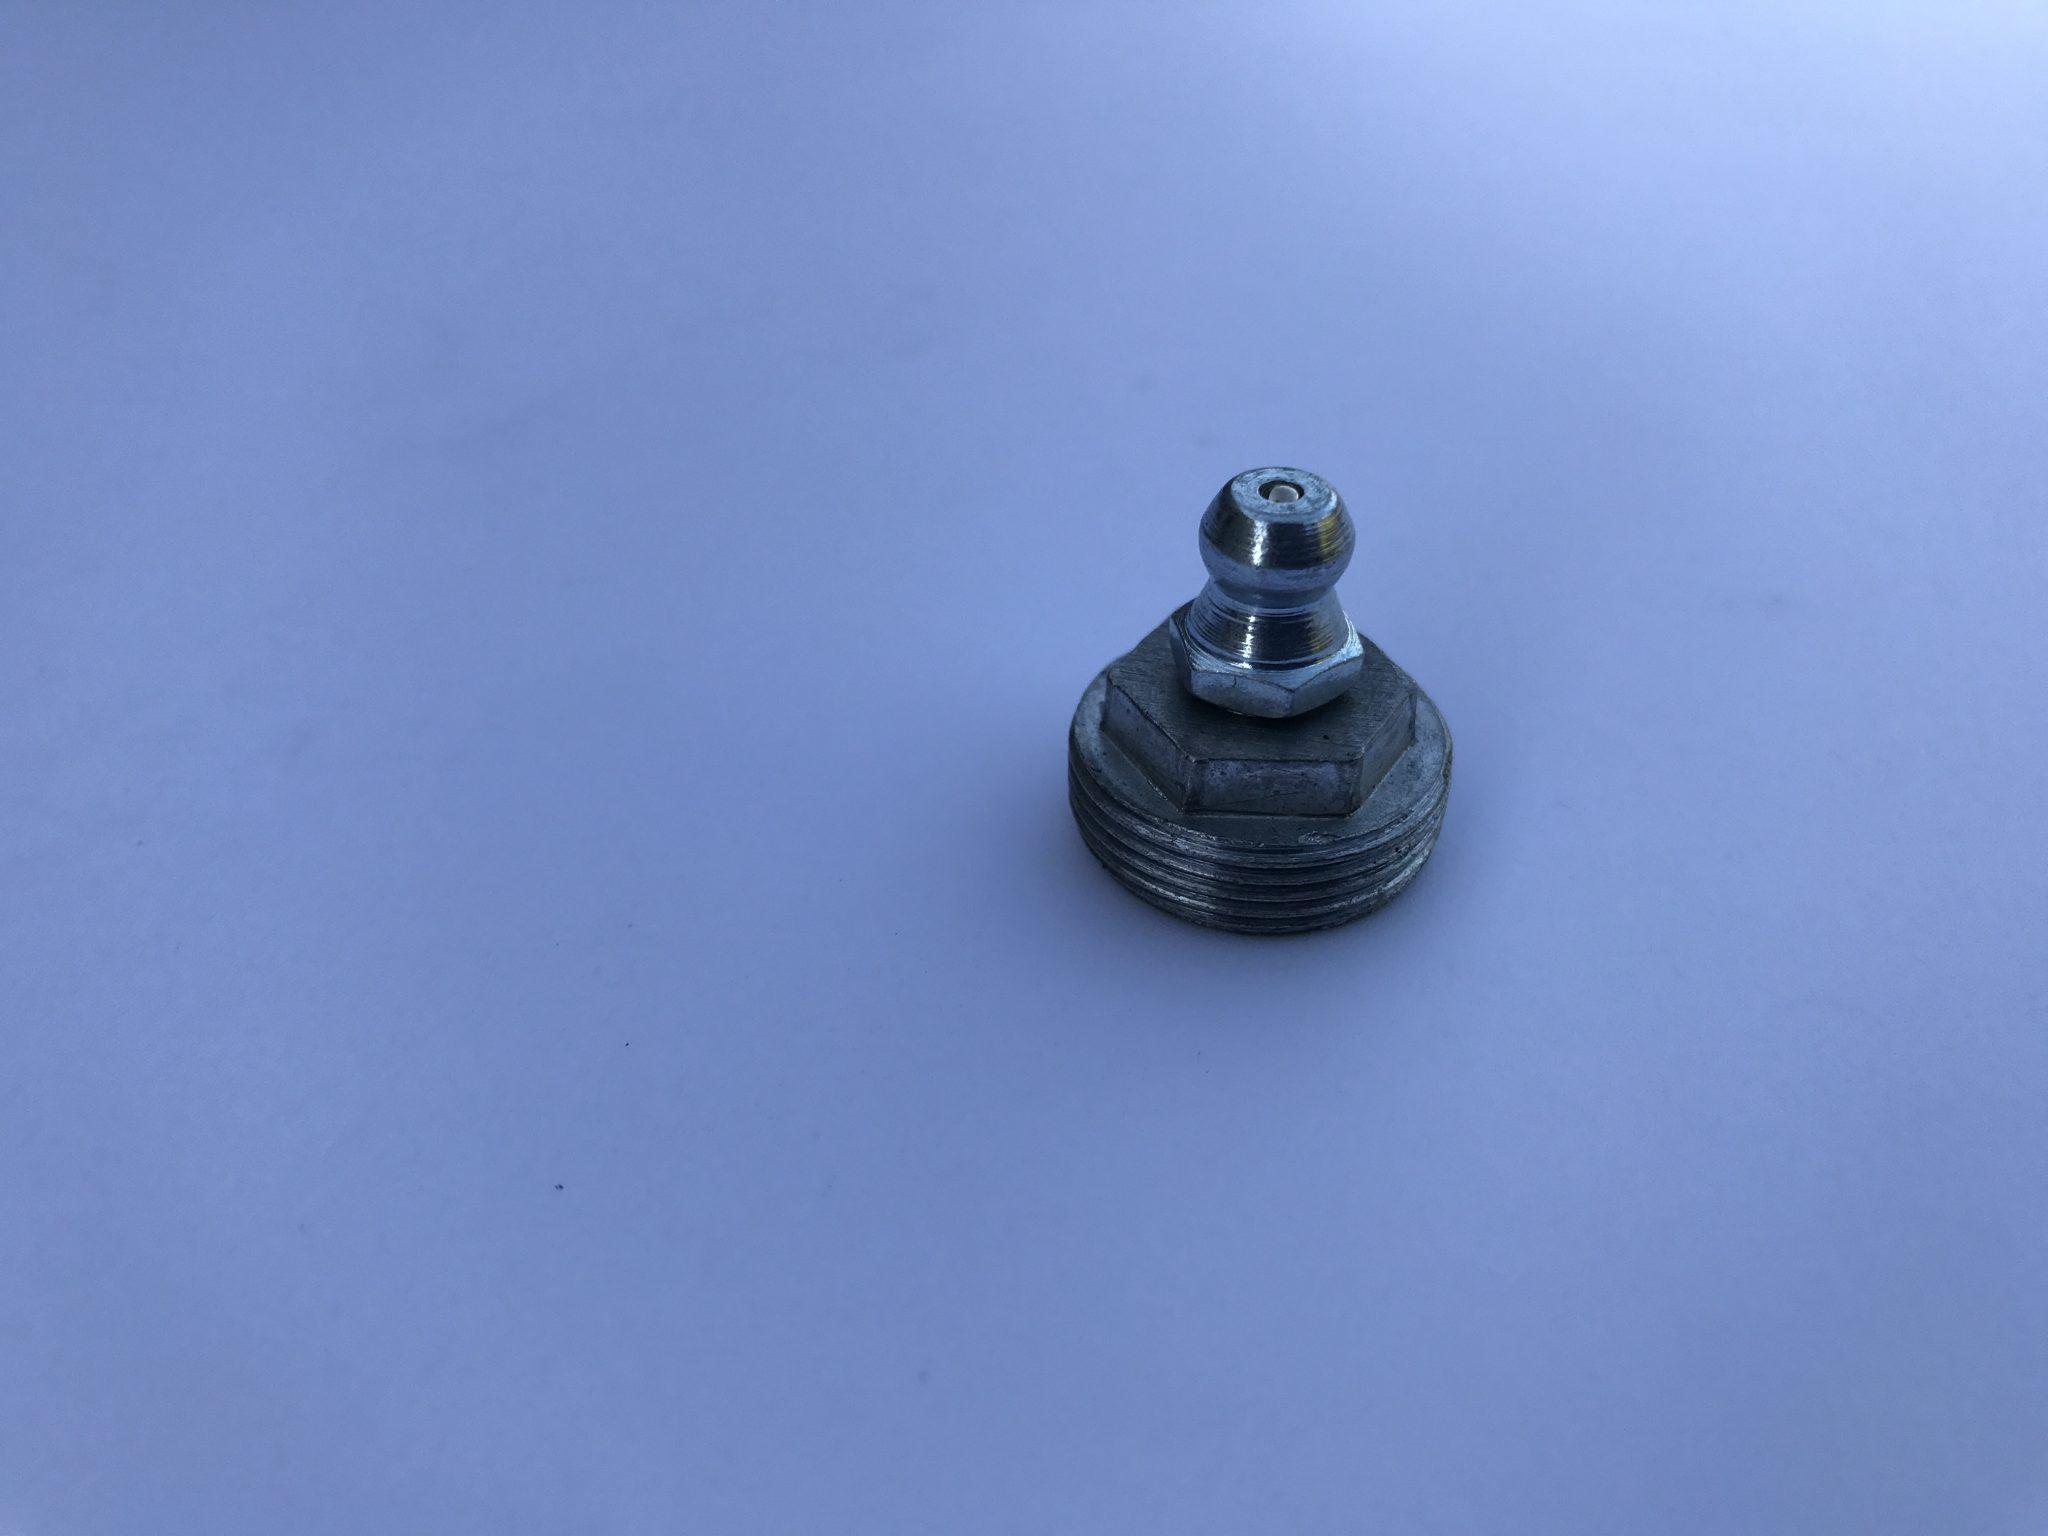 MG Midget and Austin Healey Sprite front wishbone grease nipple and plug